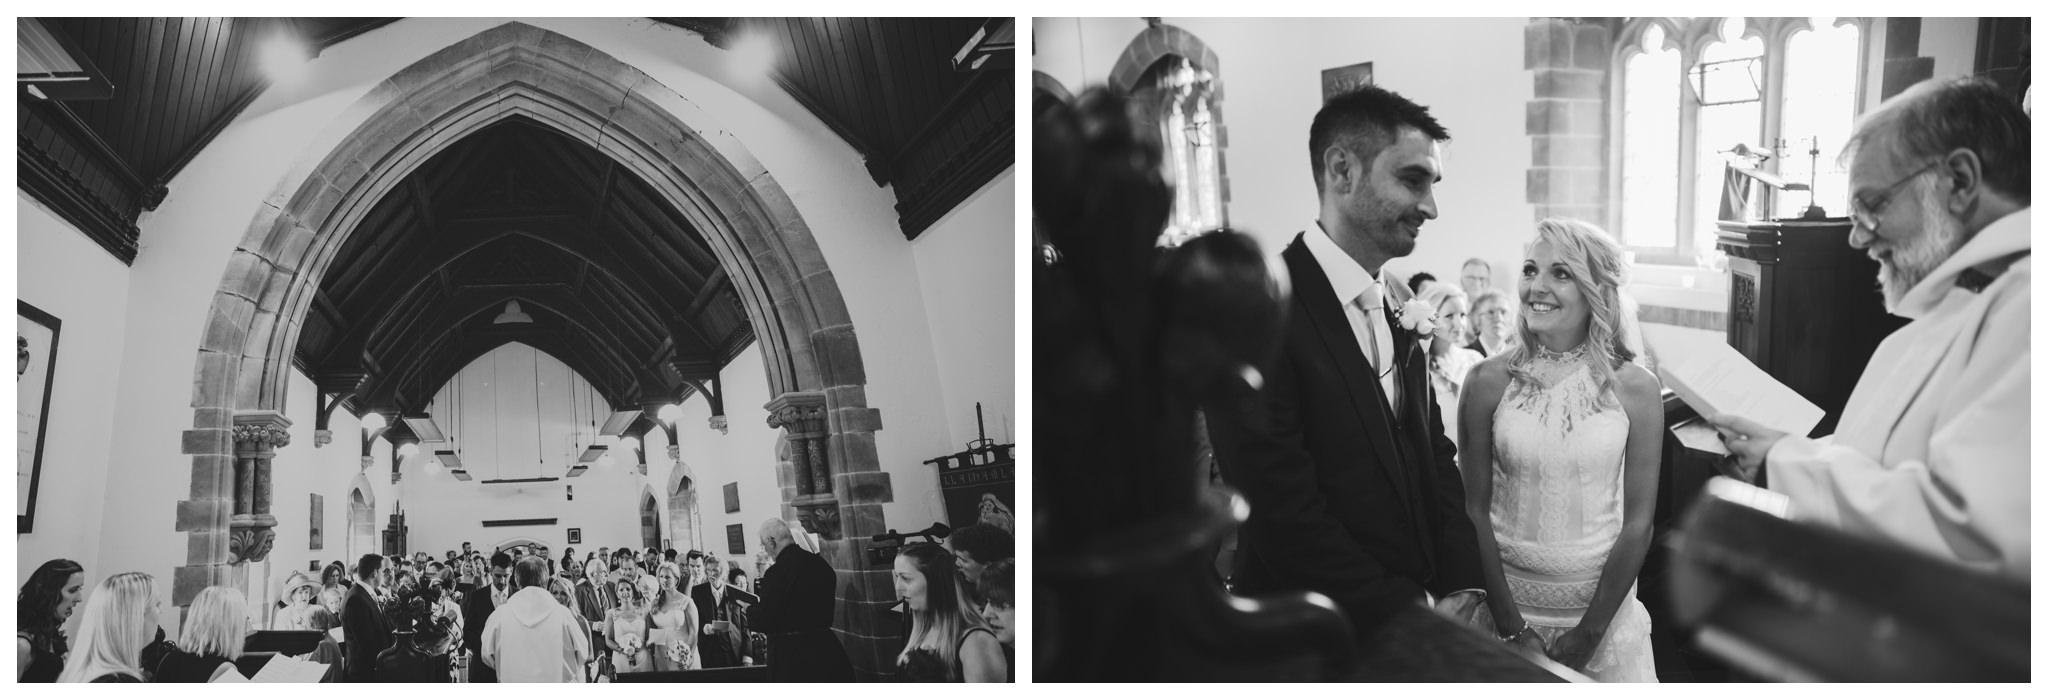 Richard Savage Photography - Wedding - Peterstone Court Brecon - 2016-05-11_0025